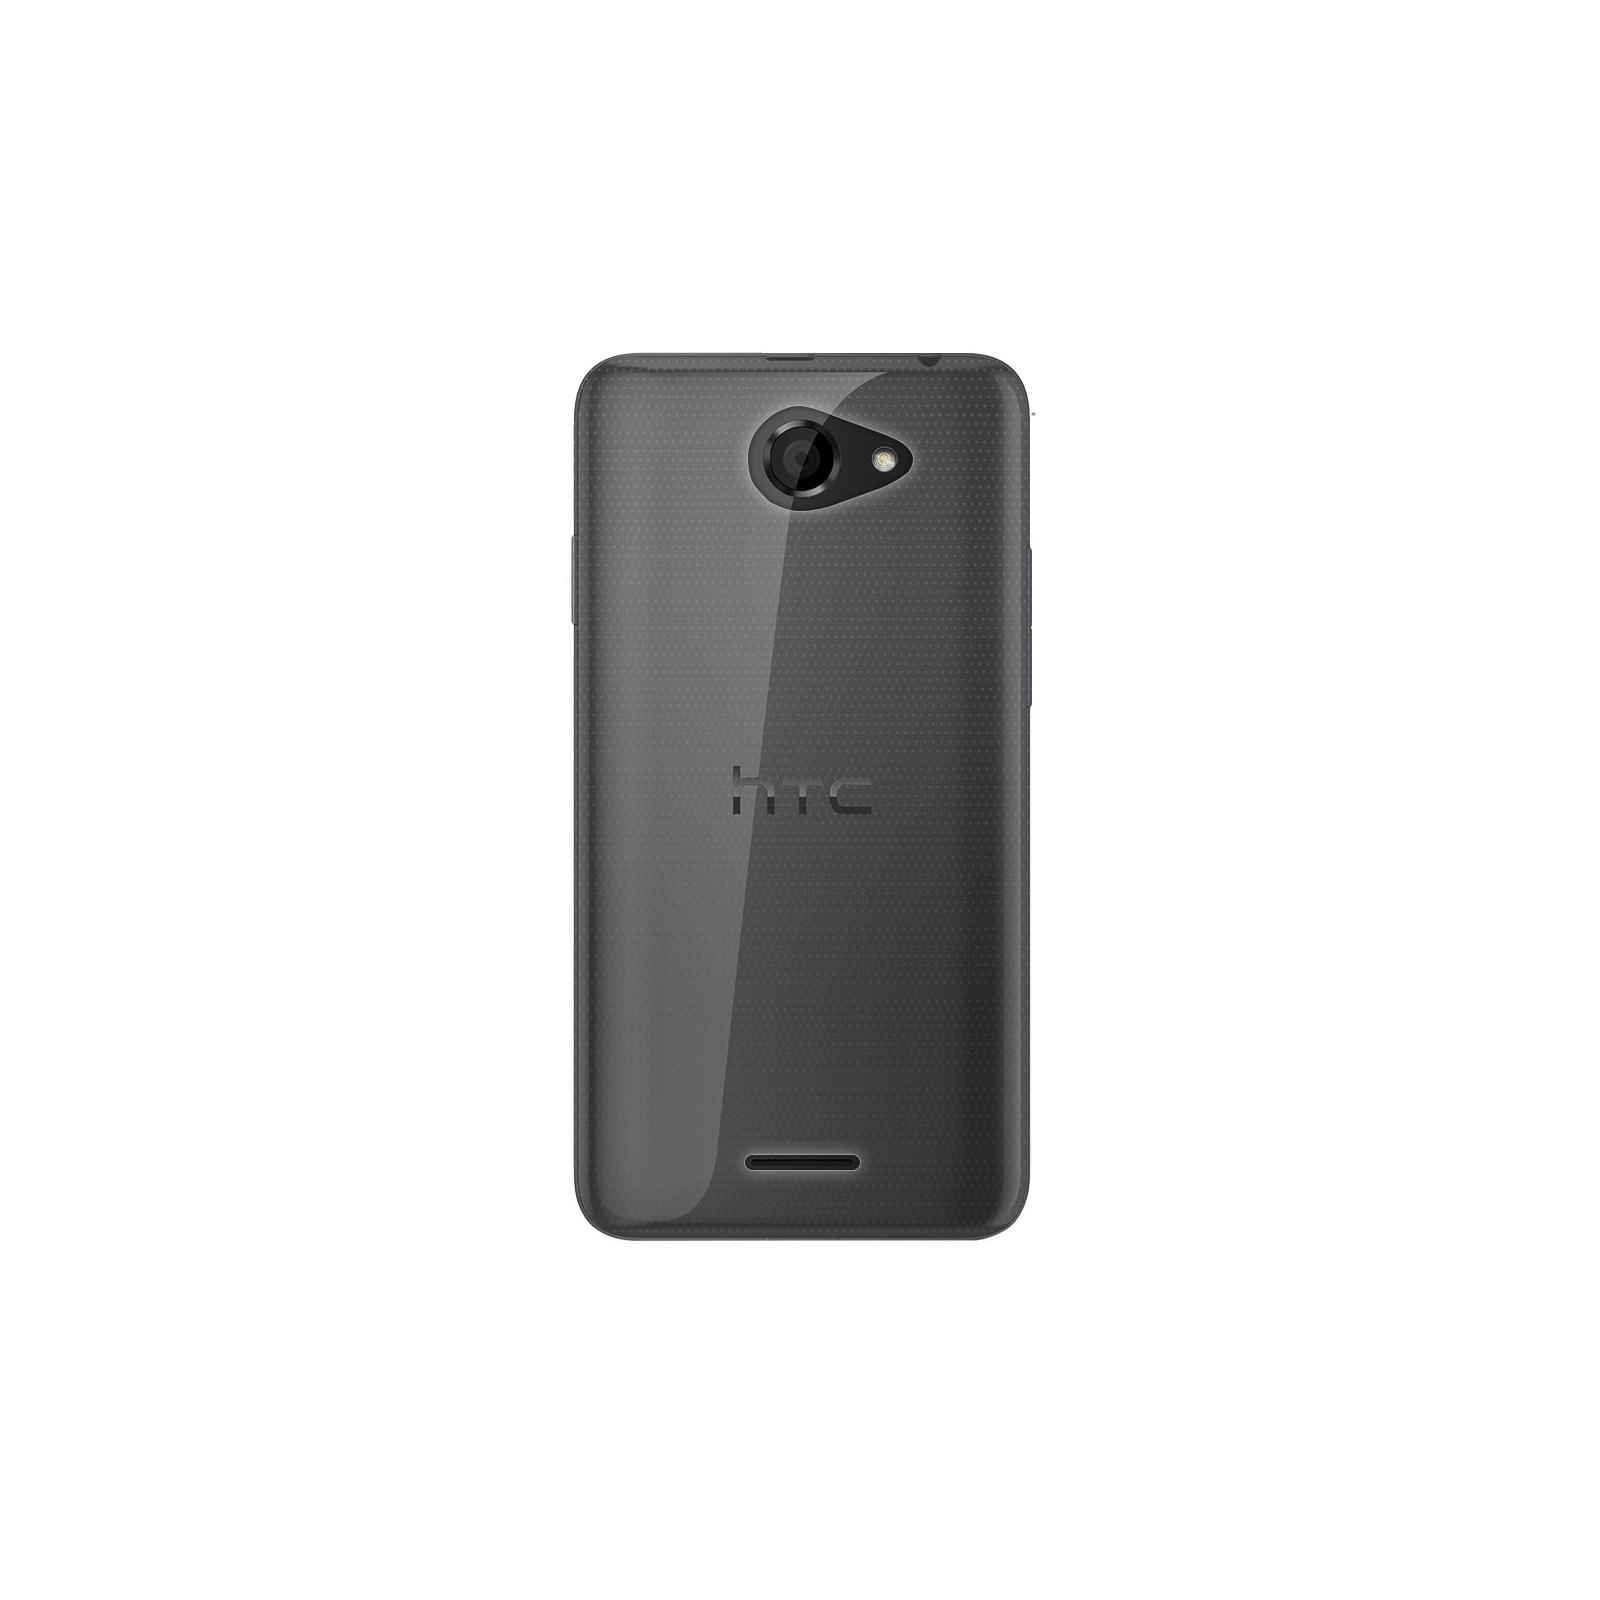 Чехол для моб. телефона GLOBAL для HTC Desire 516 (светлый) (1283126460821)